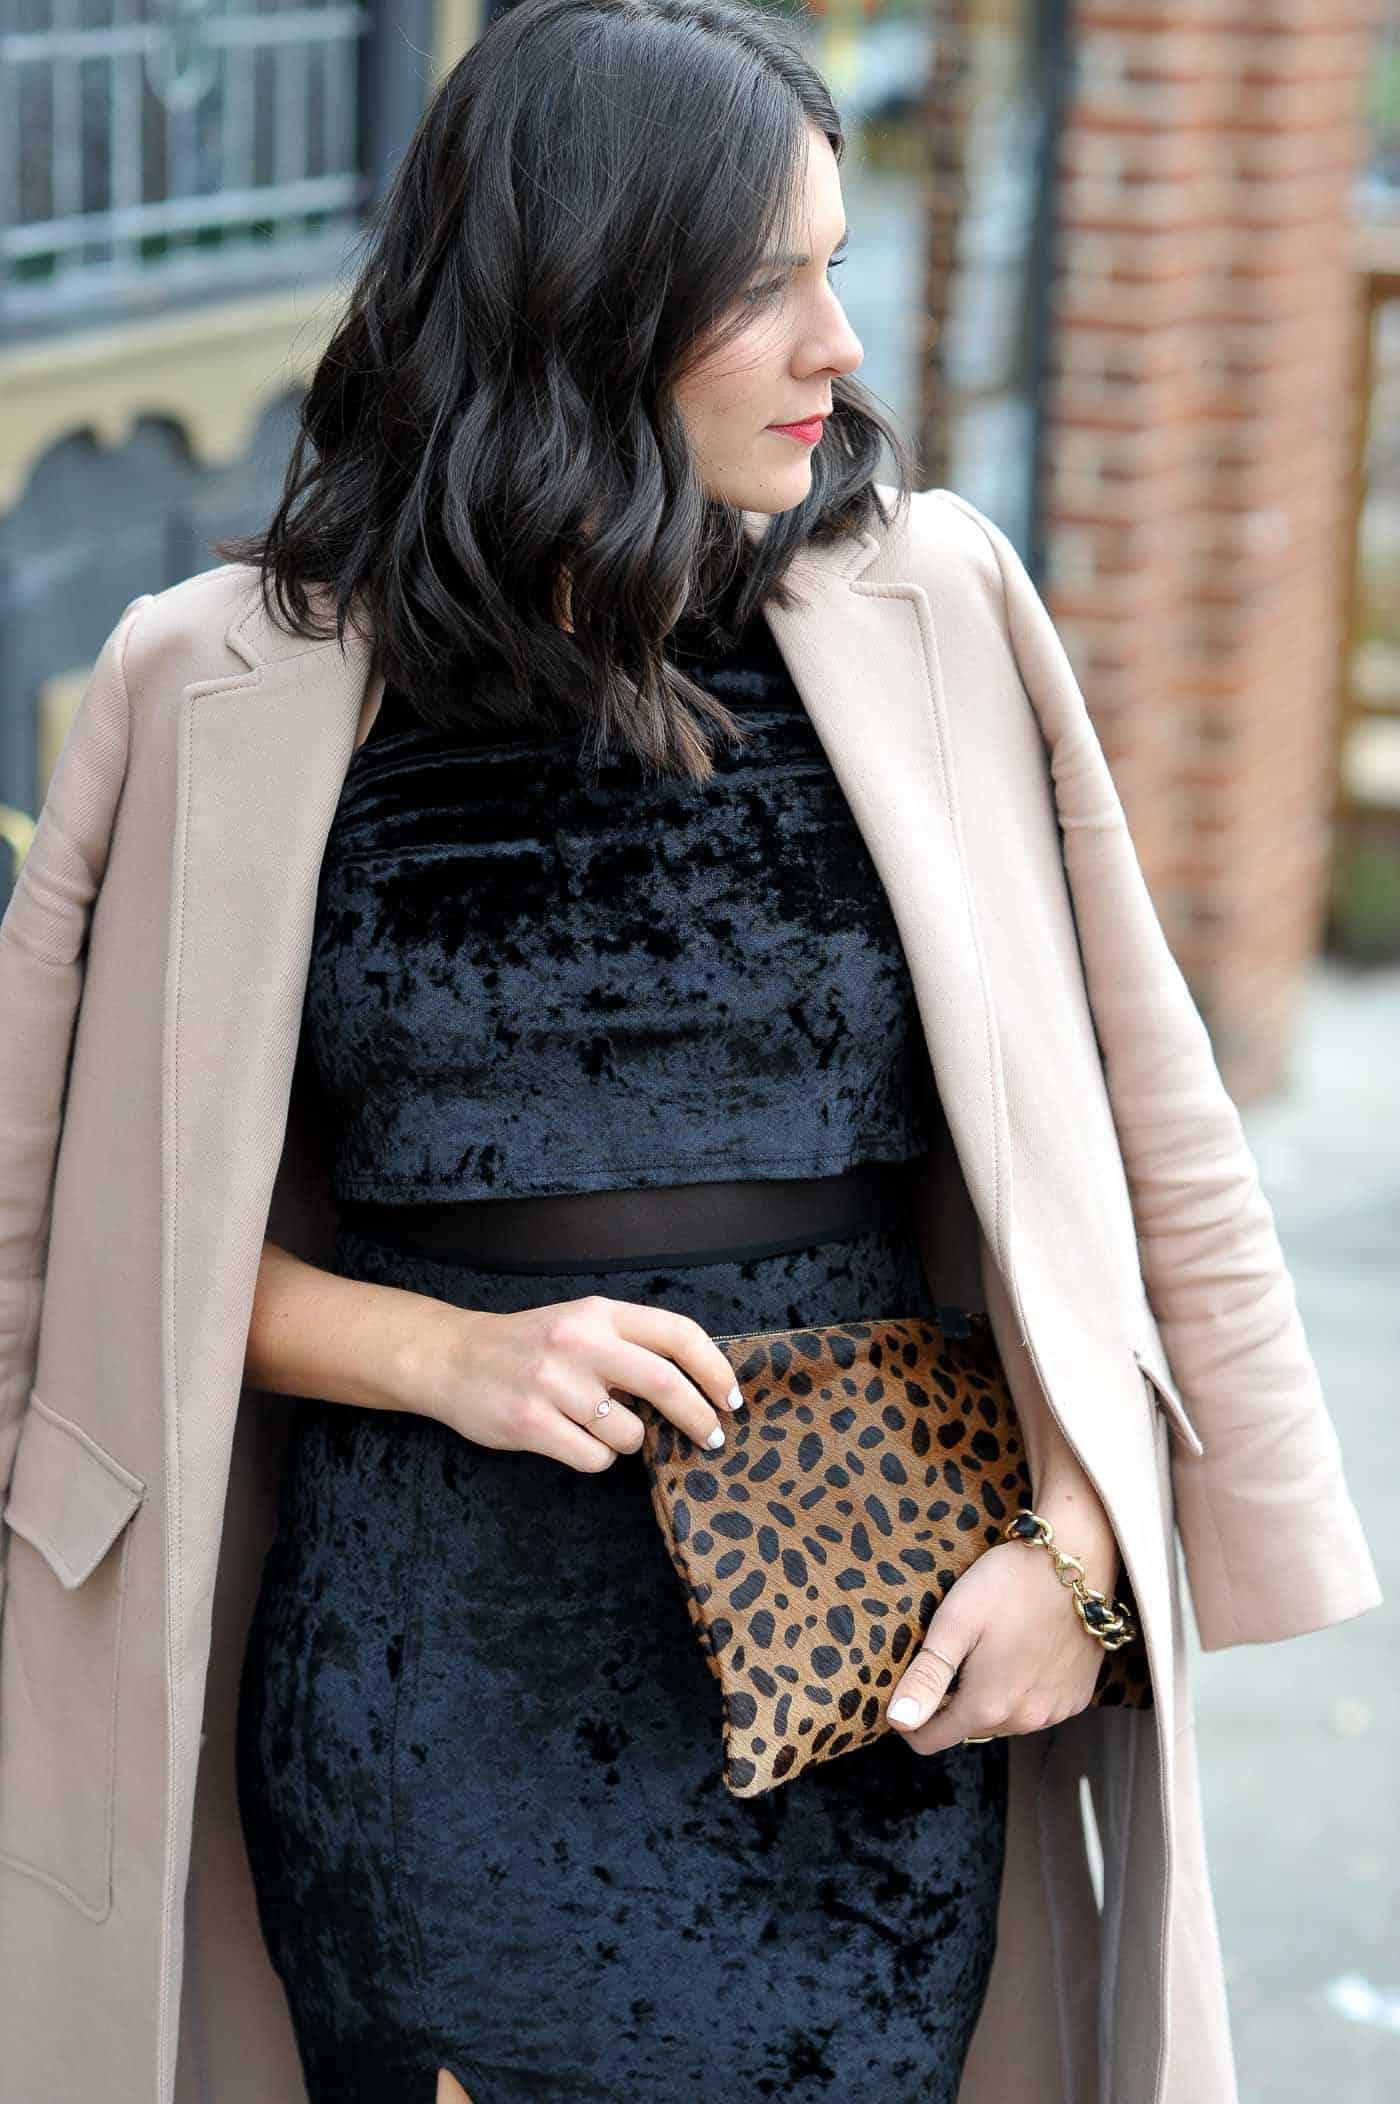 Crushed Velvet Black Midi Dress - My Style Vita